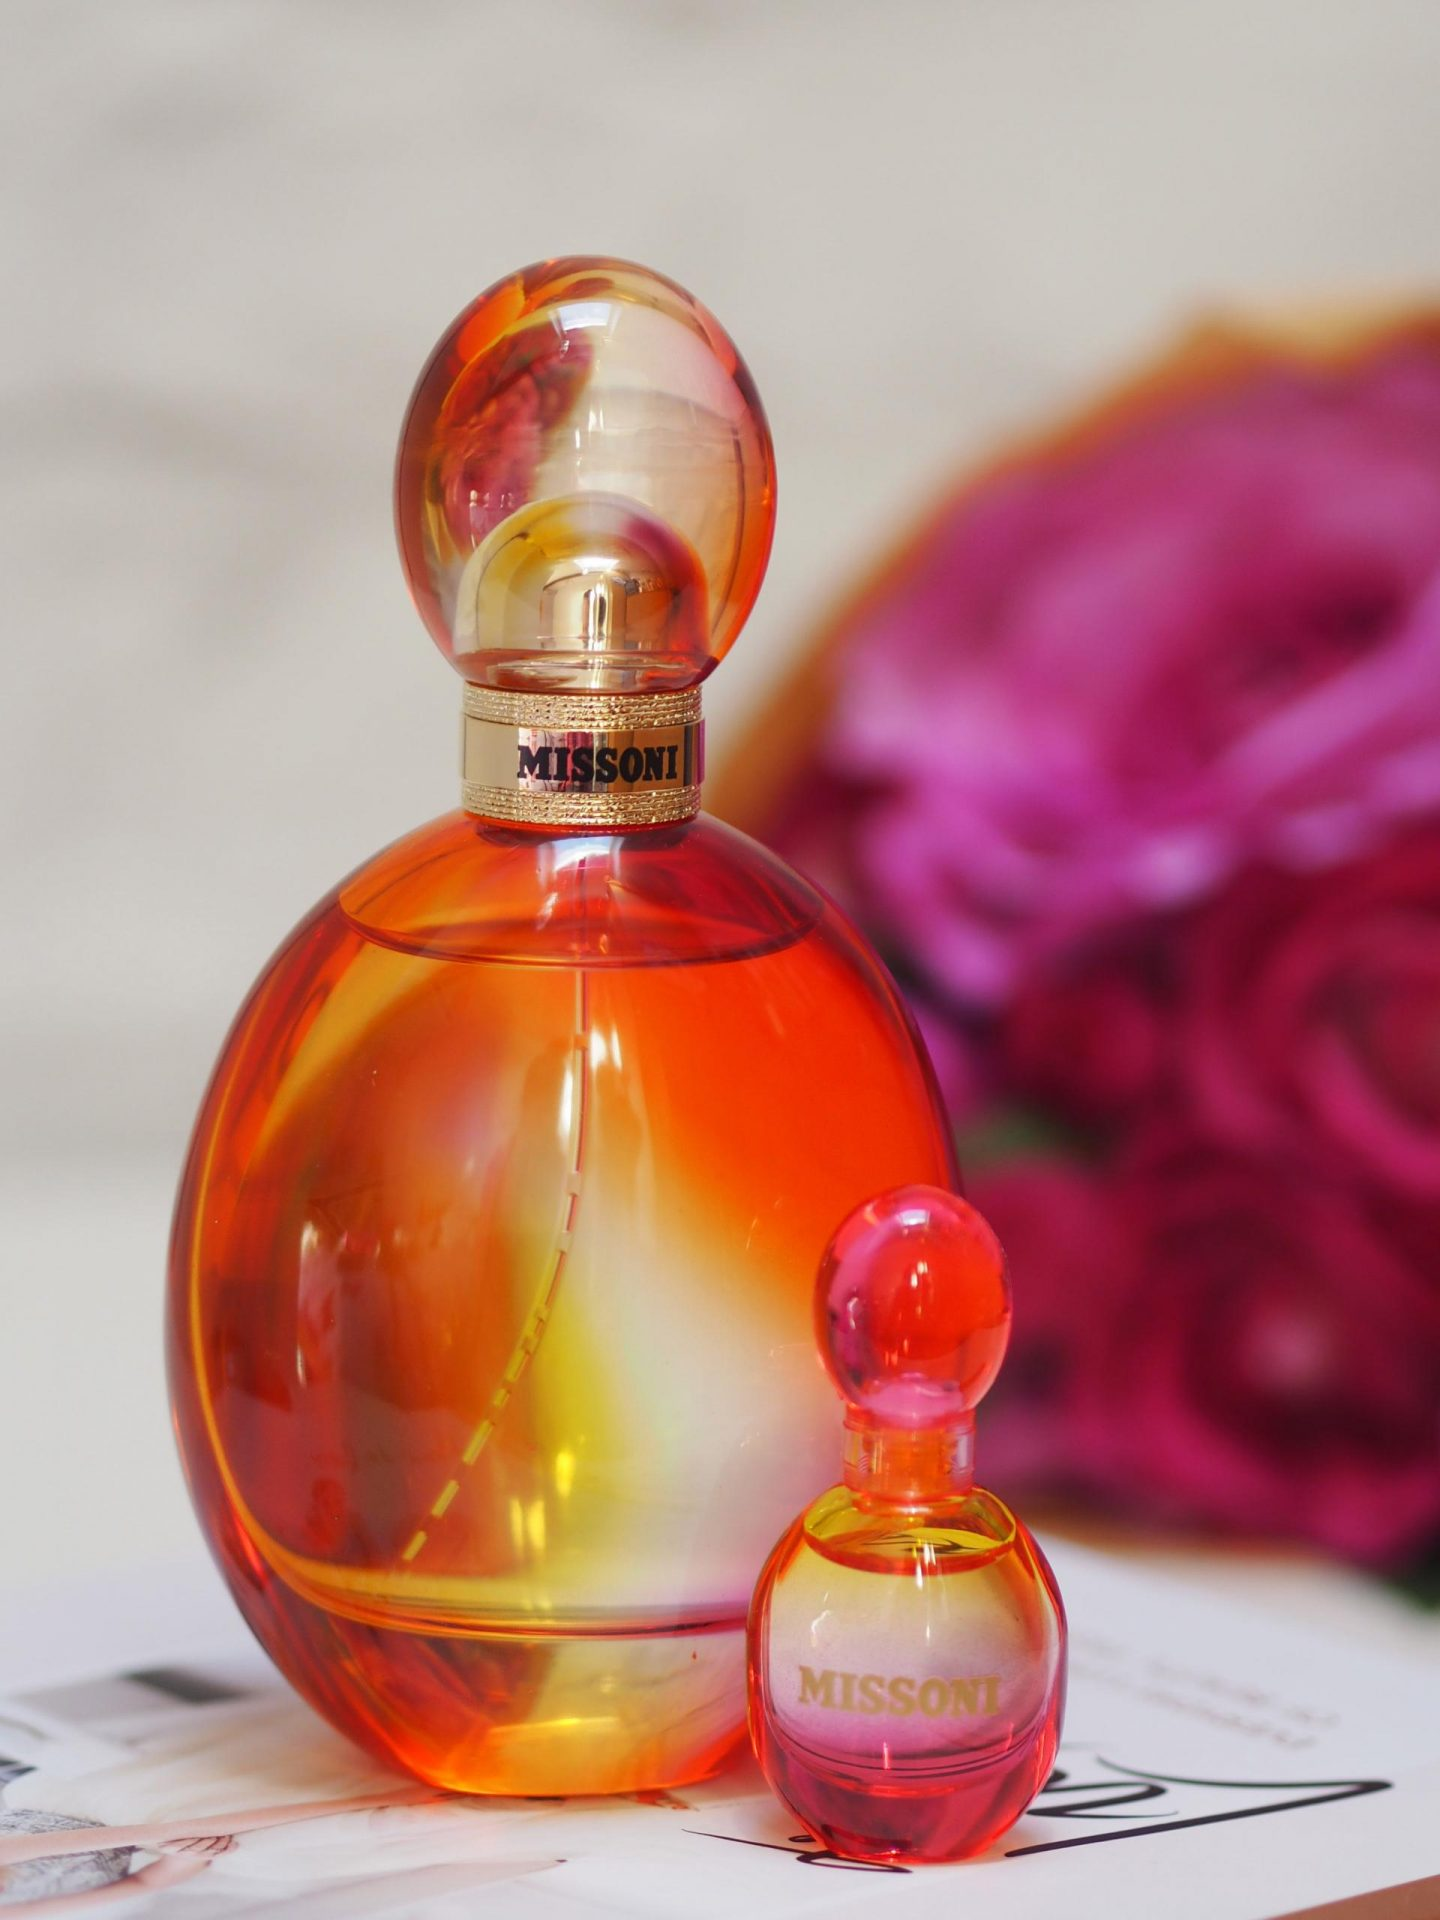 missoni-eau-de-toilette-fragrance-at-house-of-fraser-rachel-nicole-uk-beauty-blogger